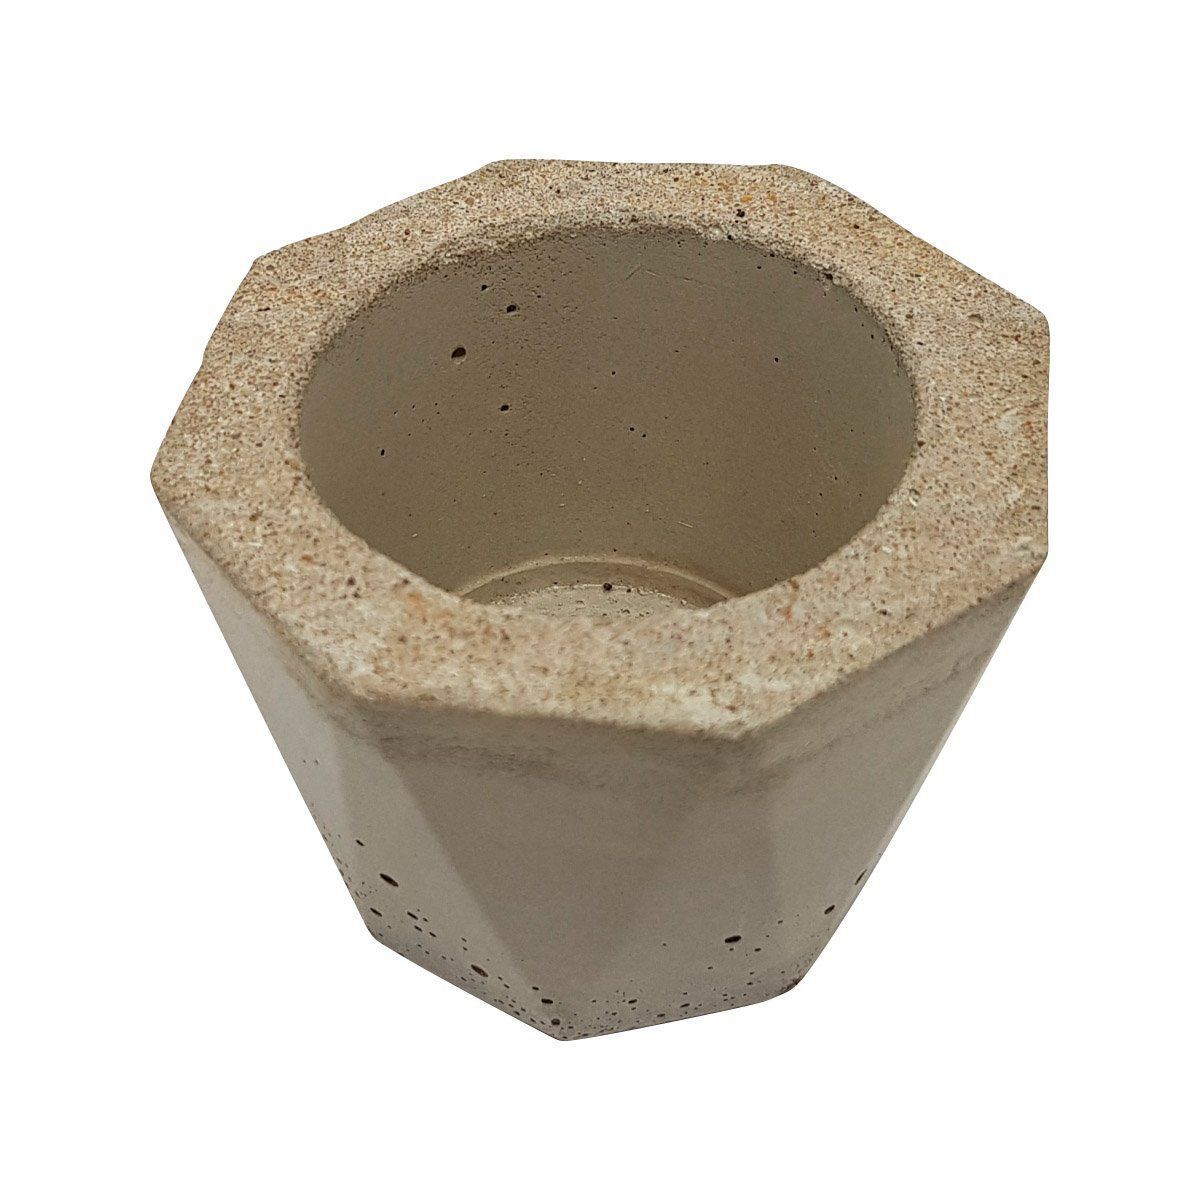 Vaso de cimento 5,5cm x 8cm MD03